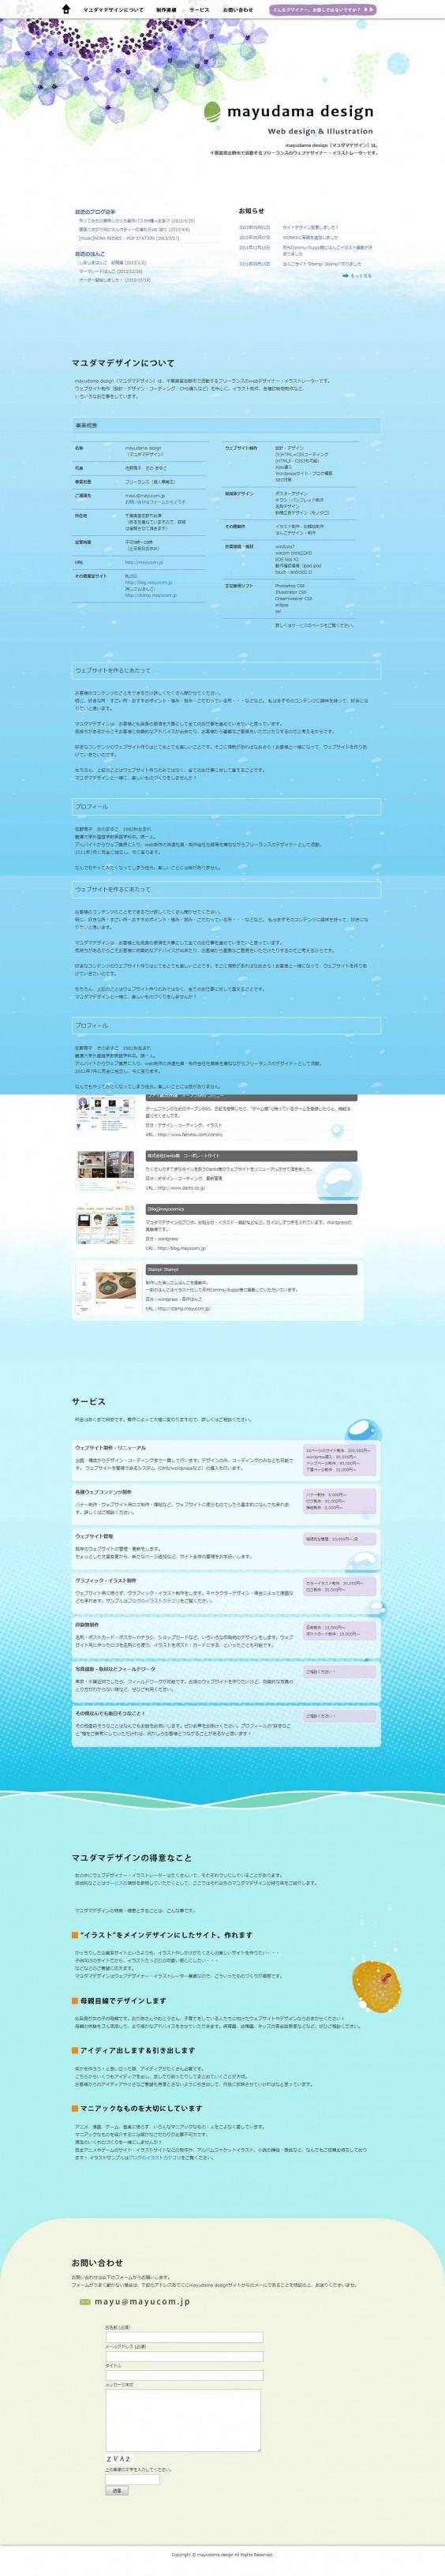 mayudama-design -マユダマデザイン-